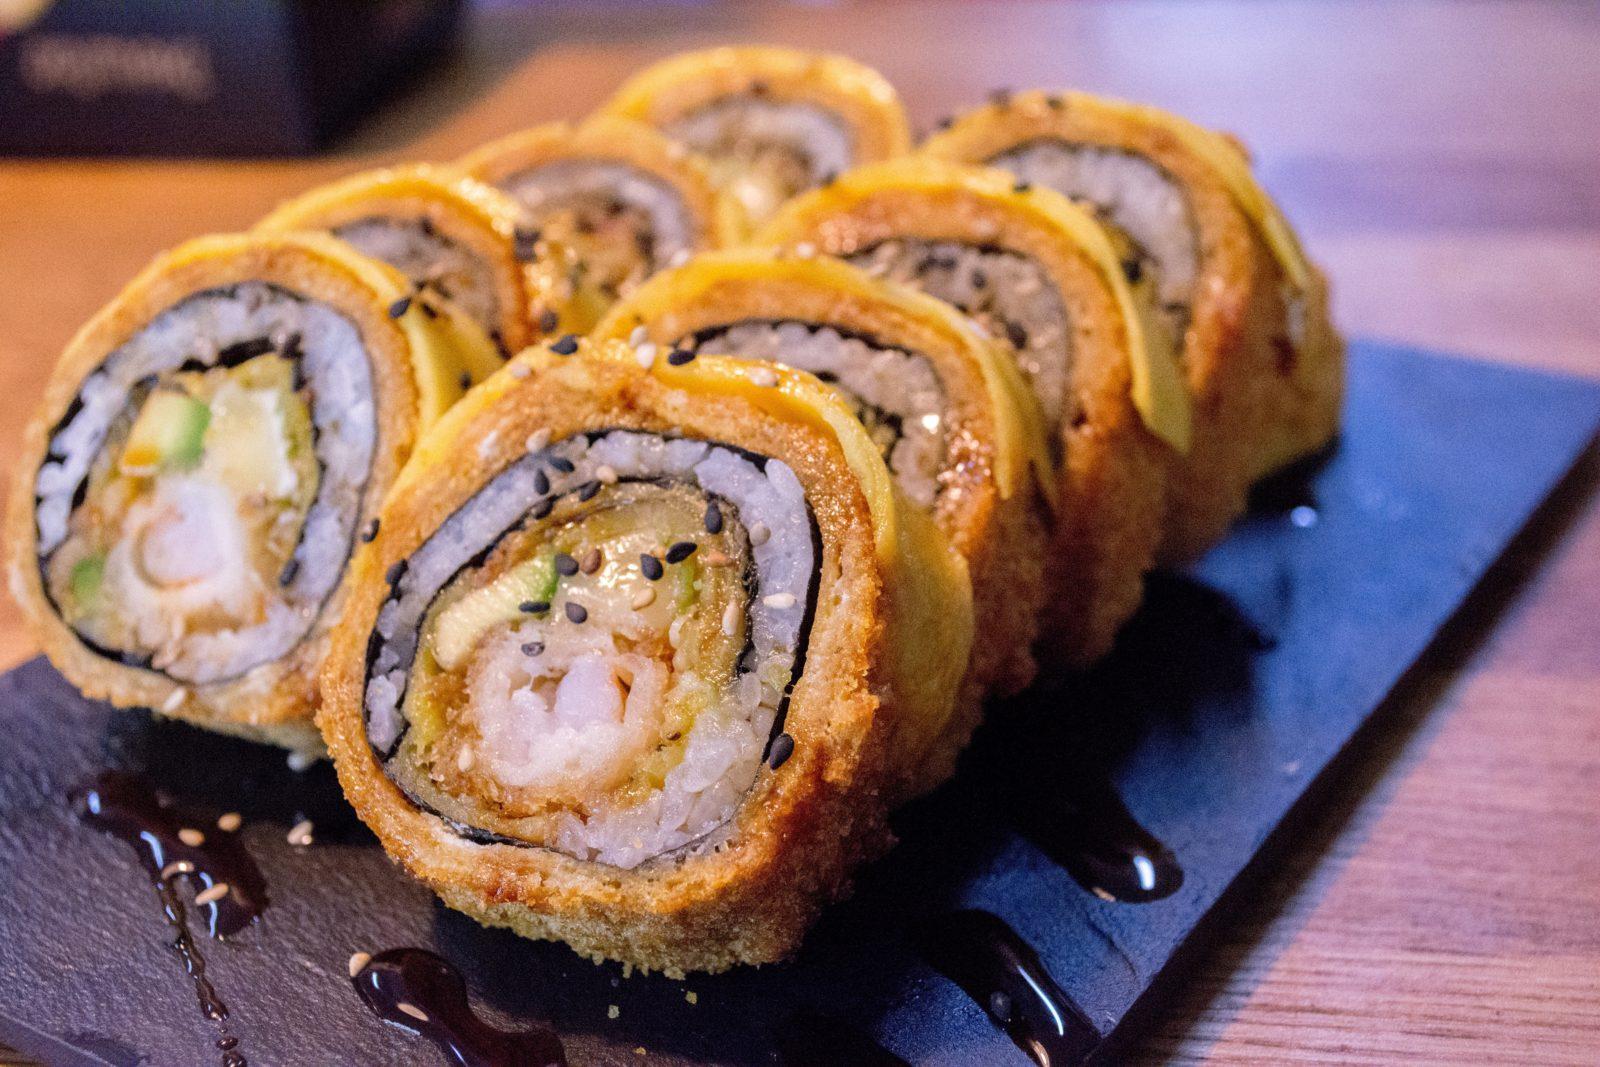 Tentacion roll Orimaki sushi